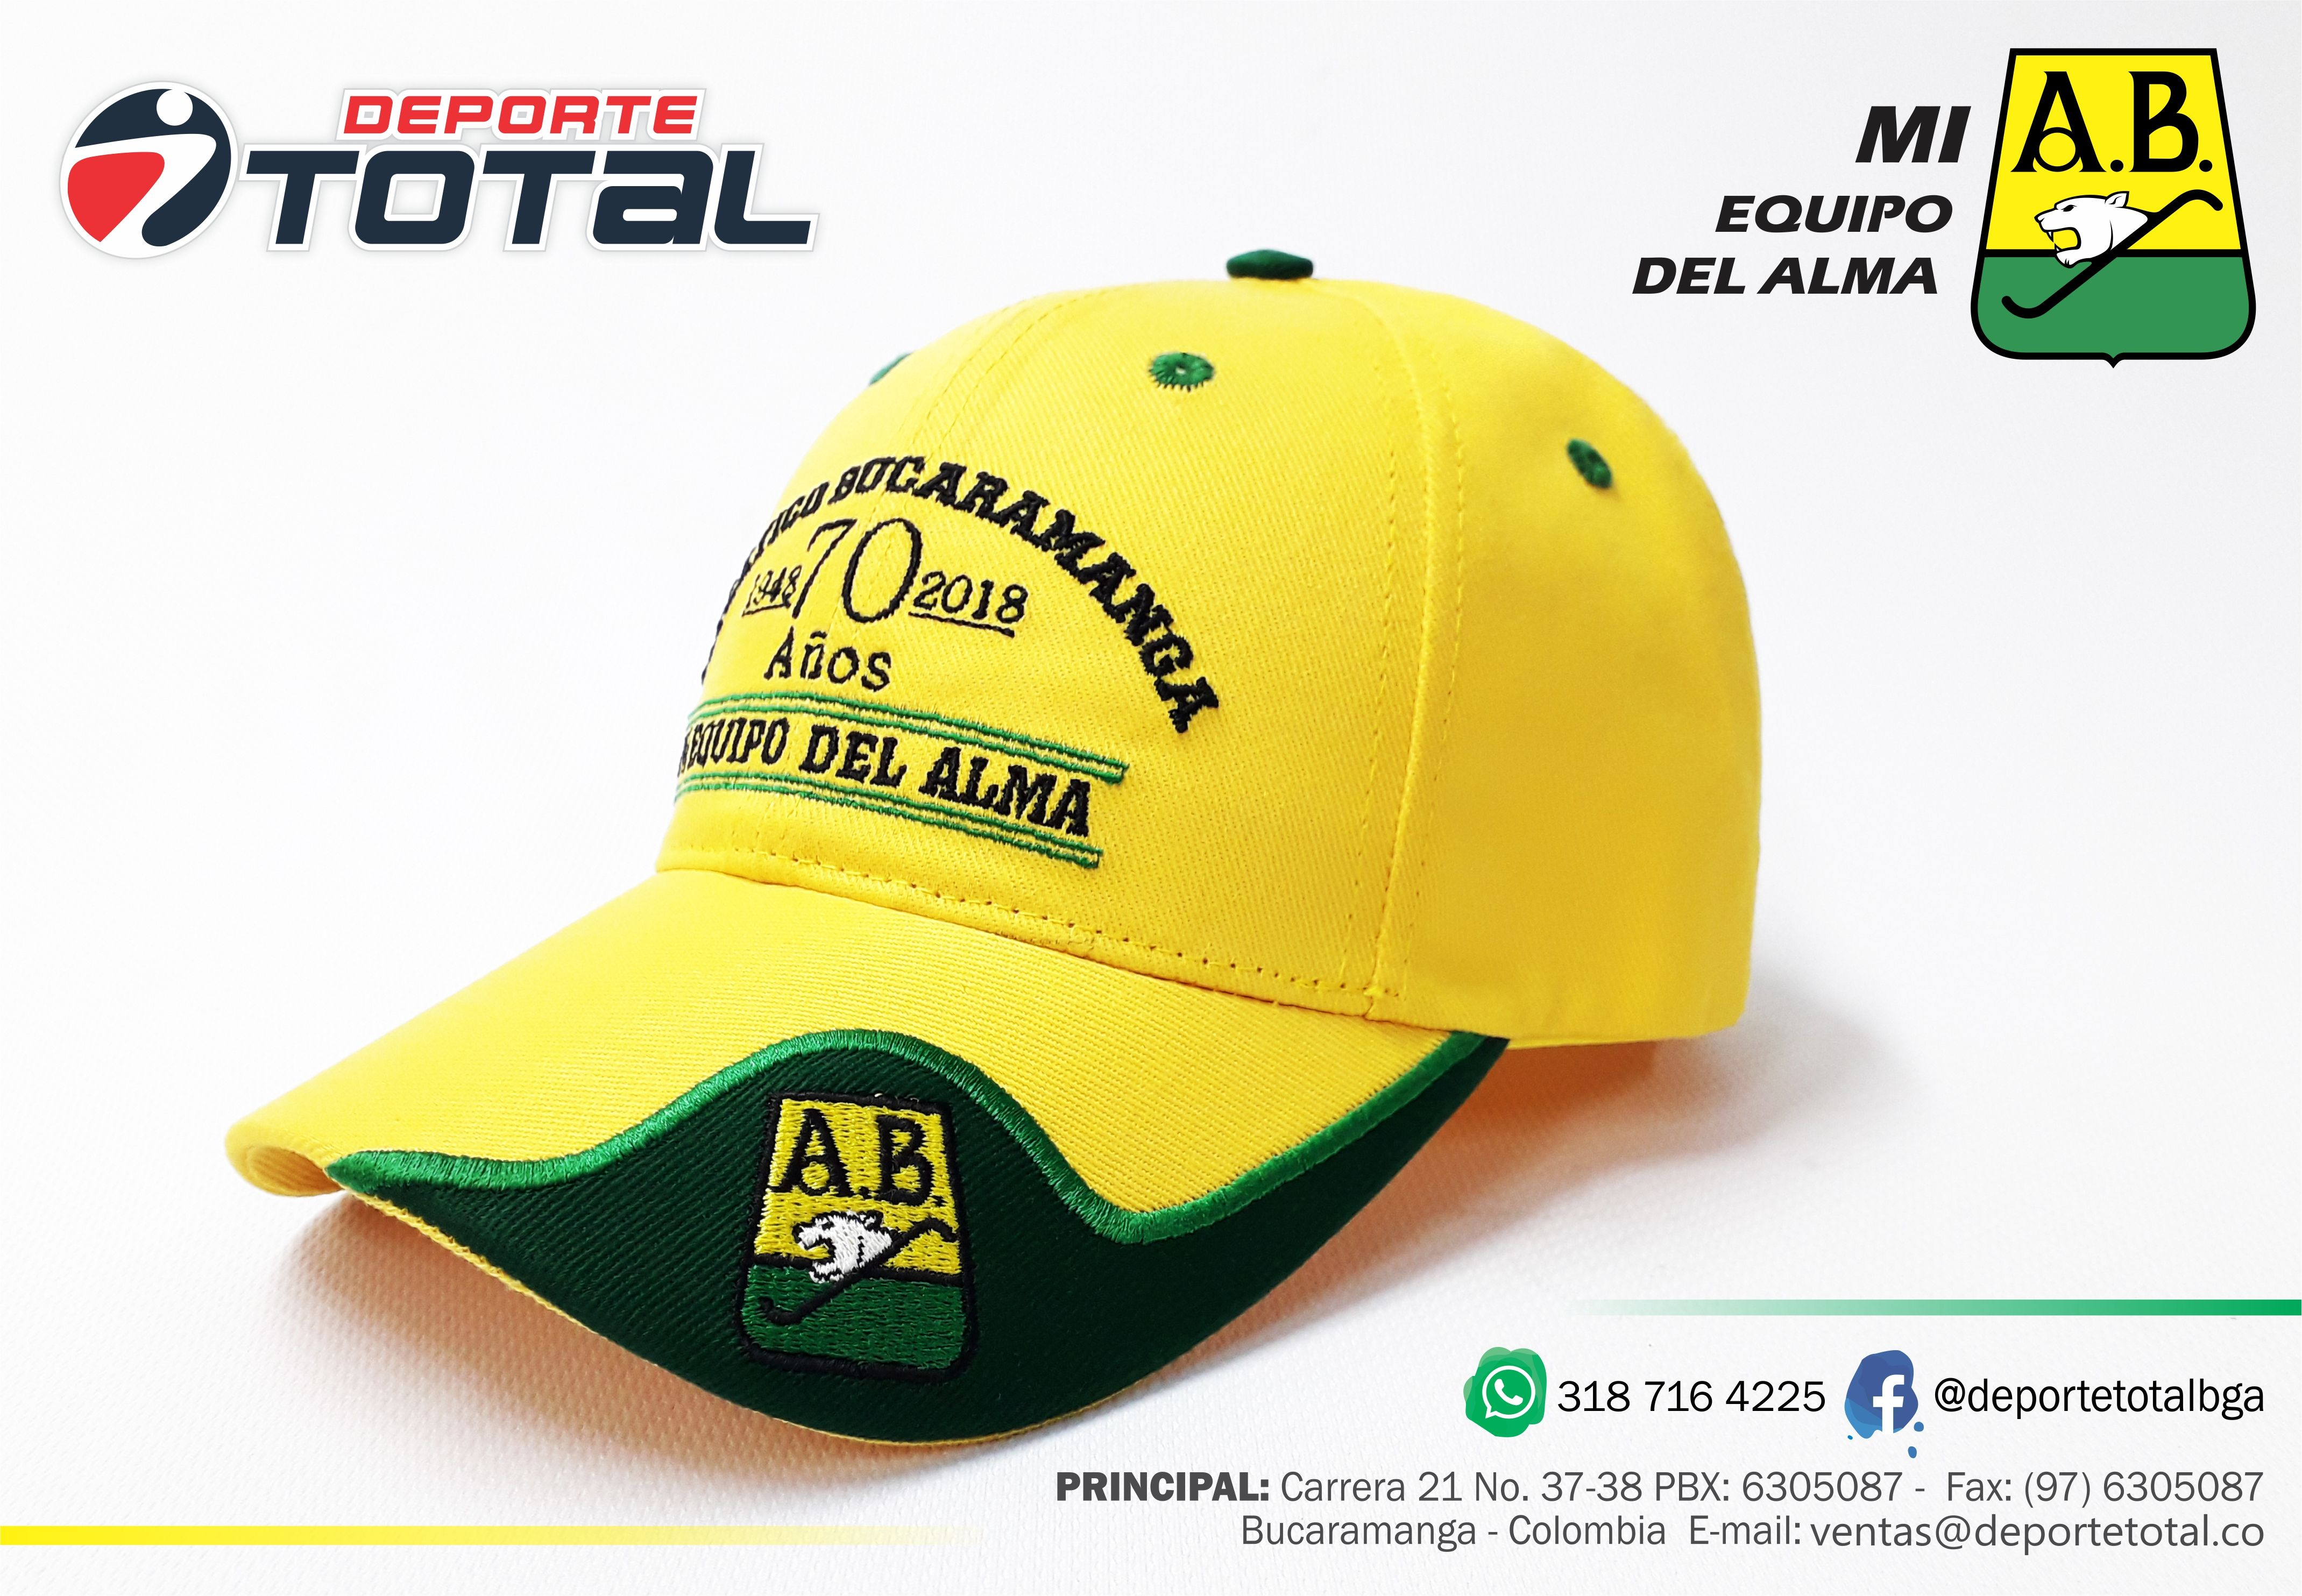 f96e283001f62 GORRA OFICIAL AB - DEPORTE TOTAL - MI EQUIPO DEL ALMA - ATLETICO BUCARAMANGA